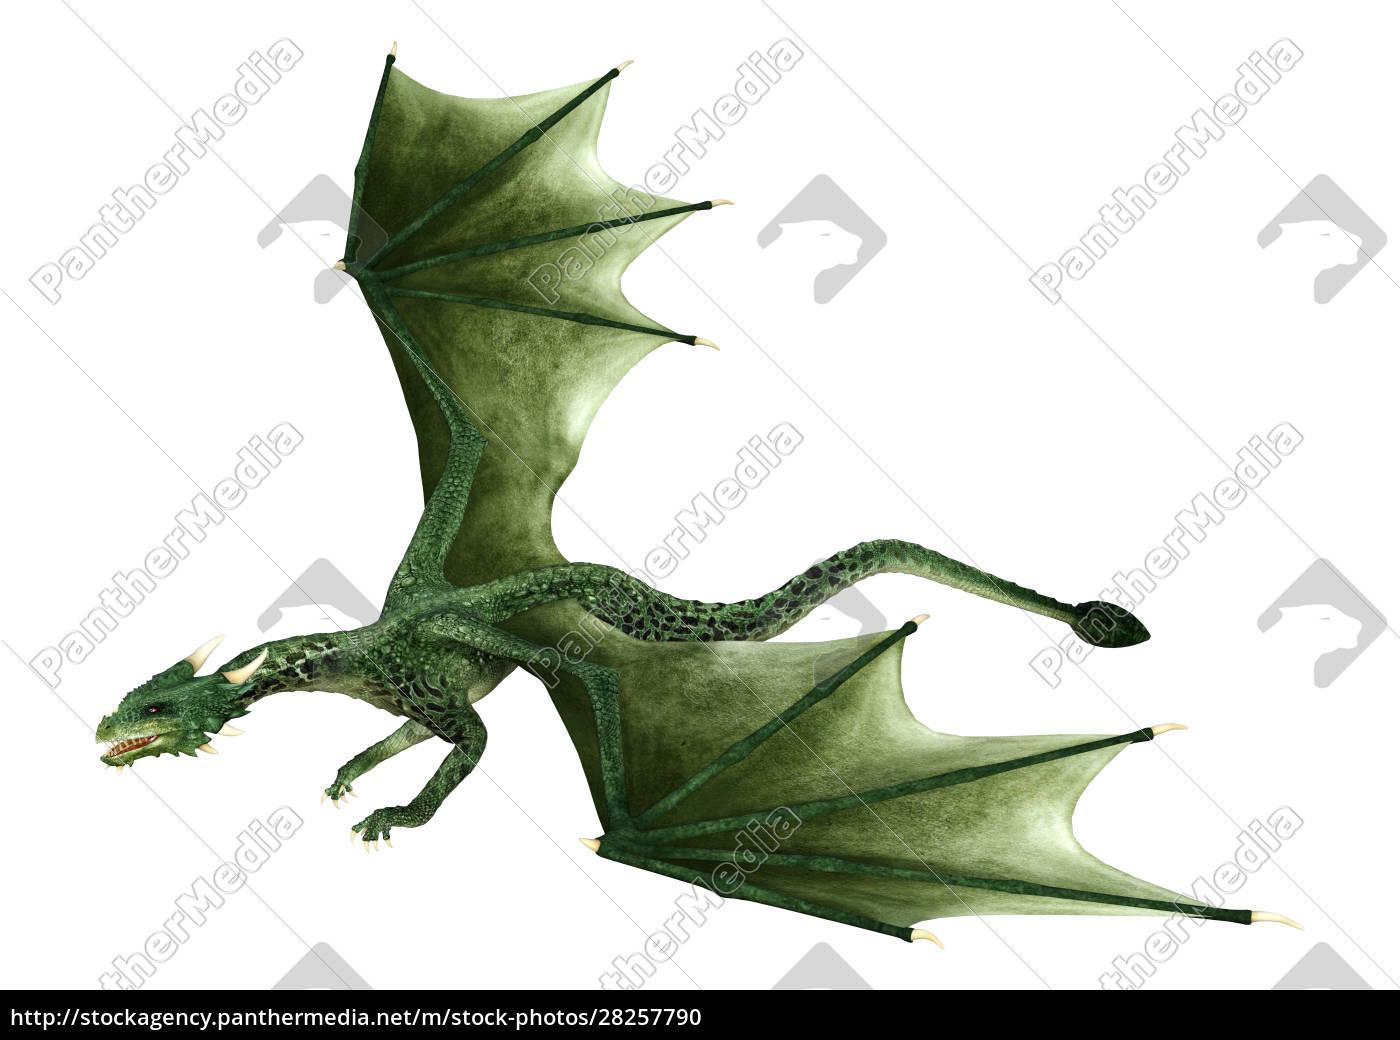 3d, rendering, fairy, tale, dragon, on - 28257790